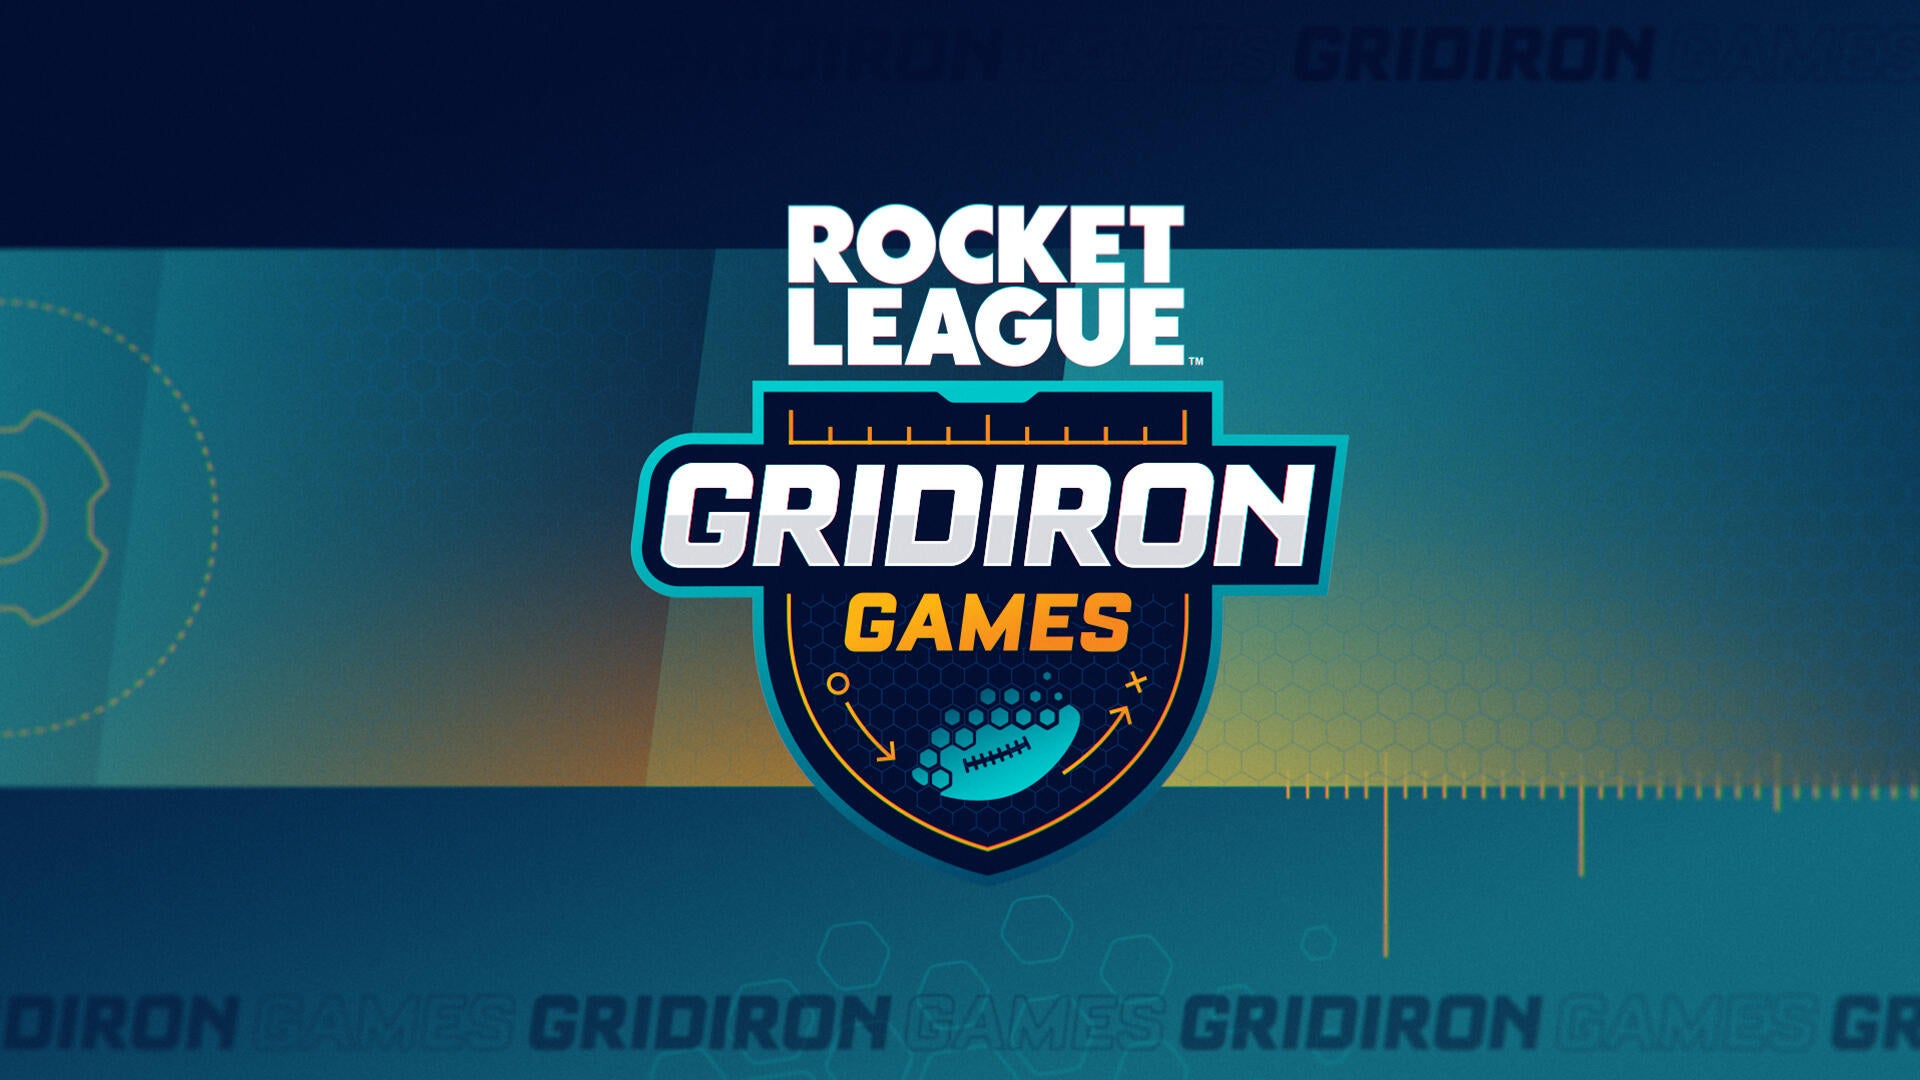 IMAGE(https://rocketleague.media.zestyio.com/Gridiron_Games_KeyArt_v1.309bf22bd29c2e411e9dd8eb07575bb1.jpg)